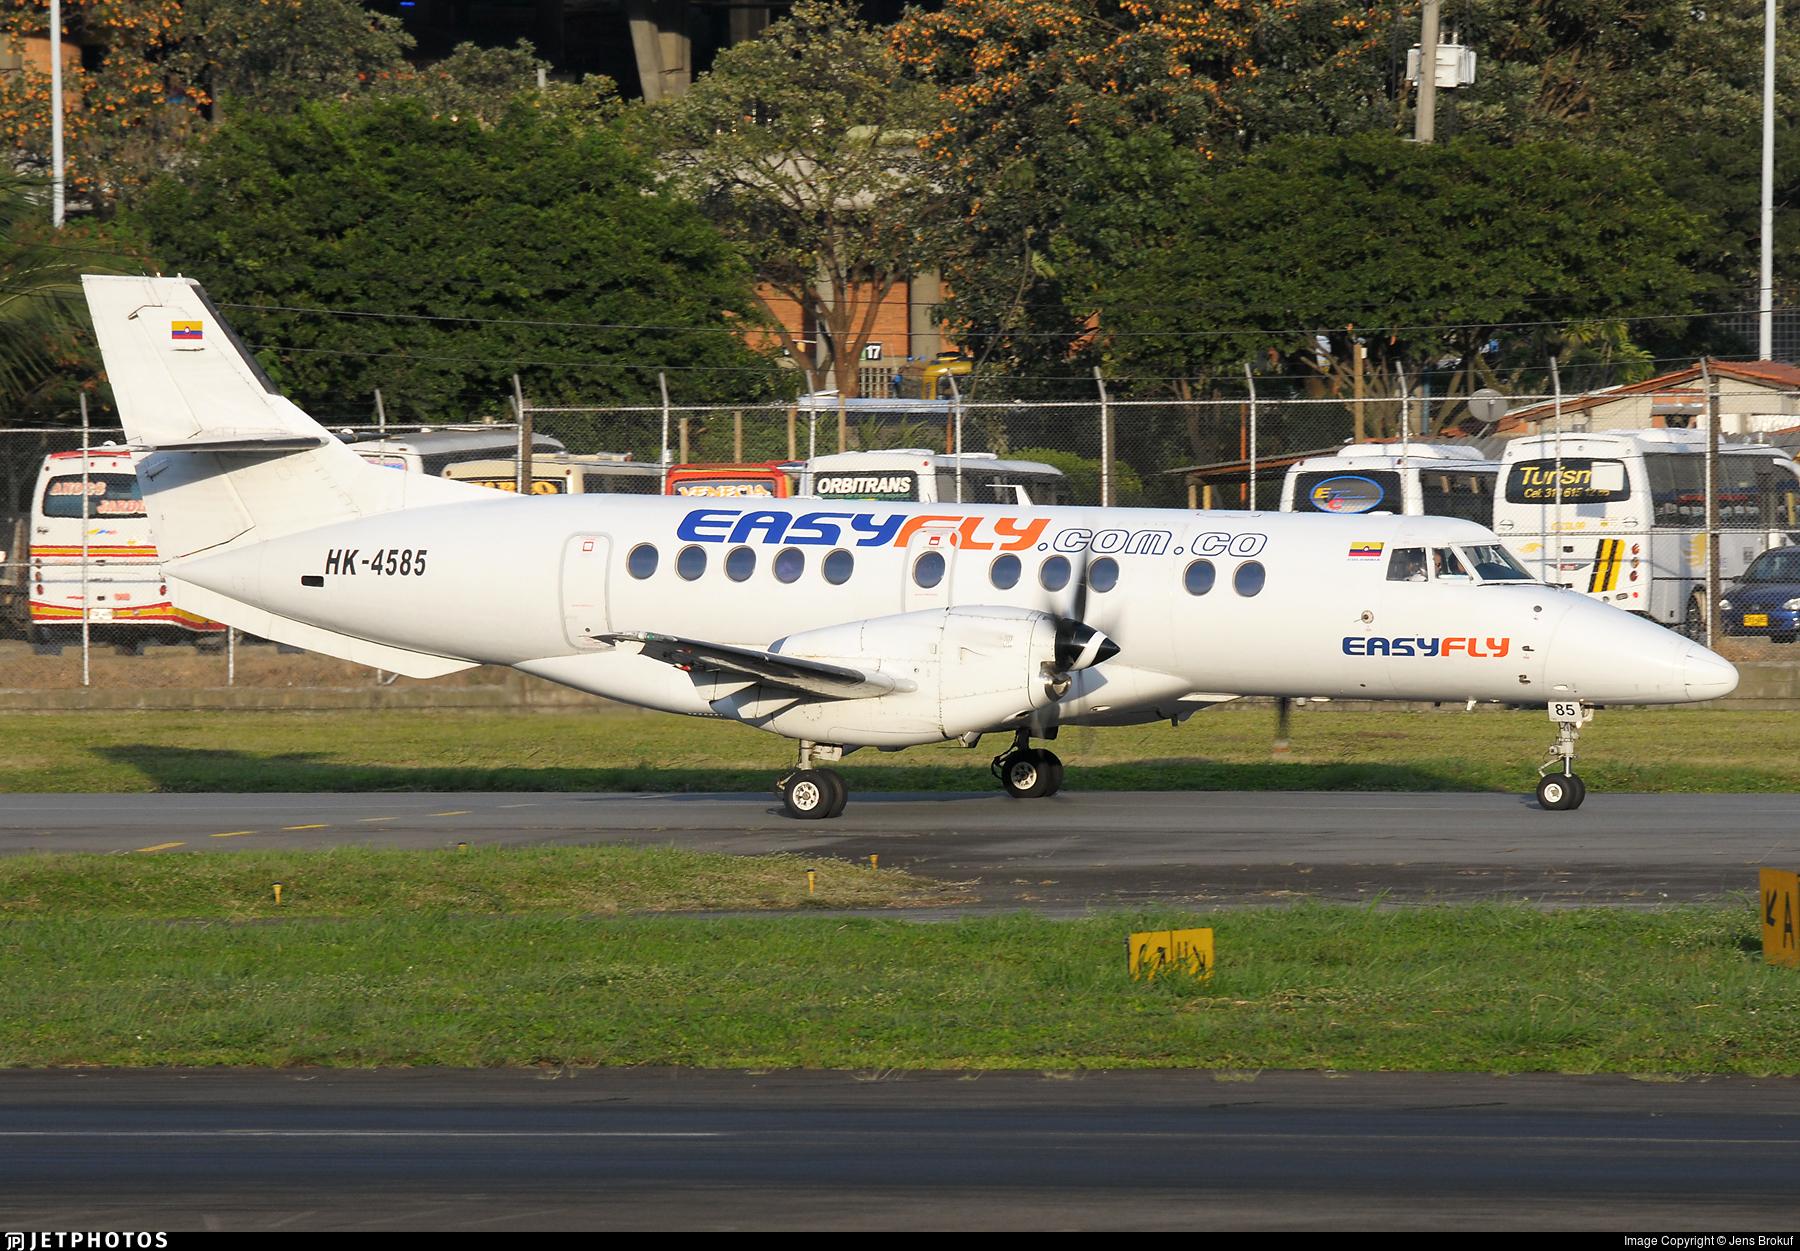 HK-4585 - British Aerospace Jetstream 41 - EasyFly